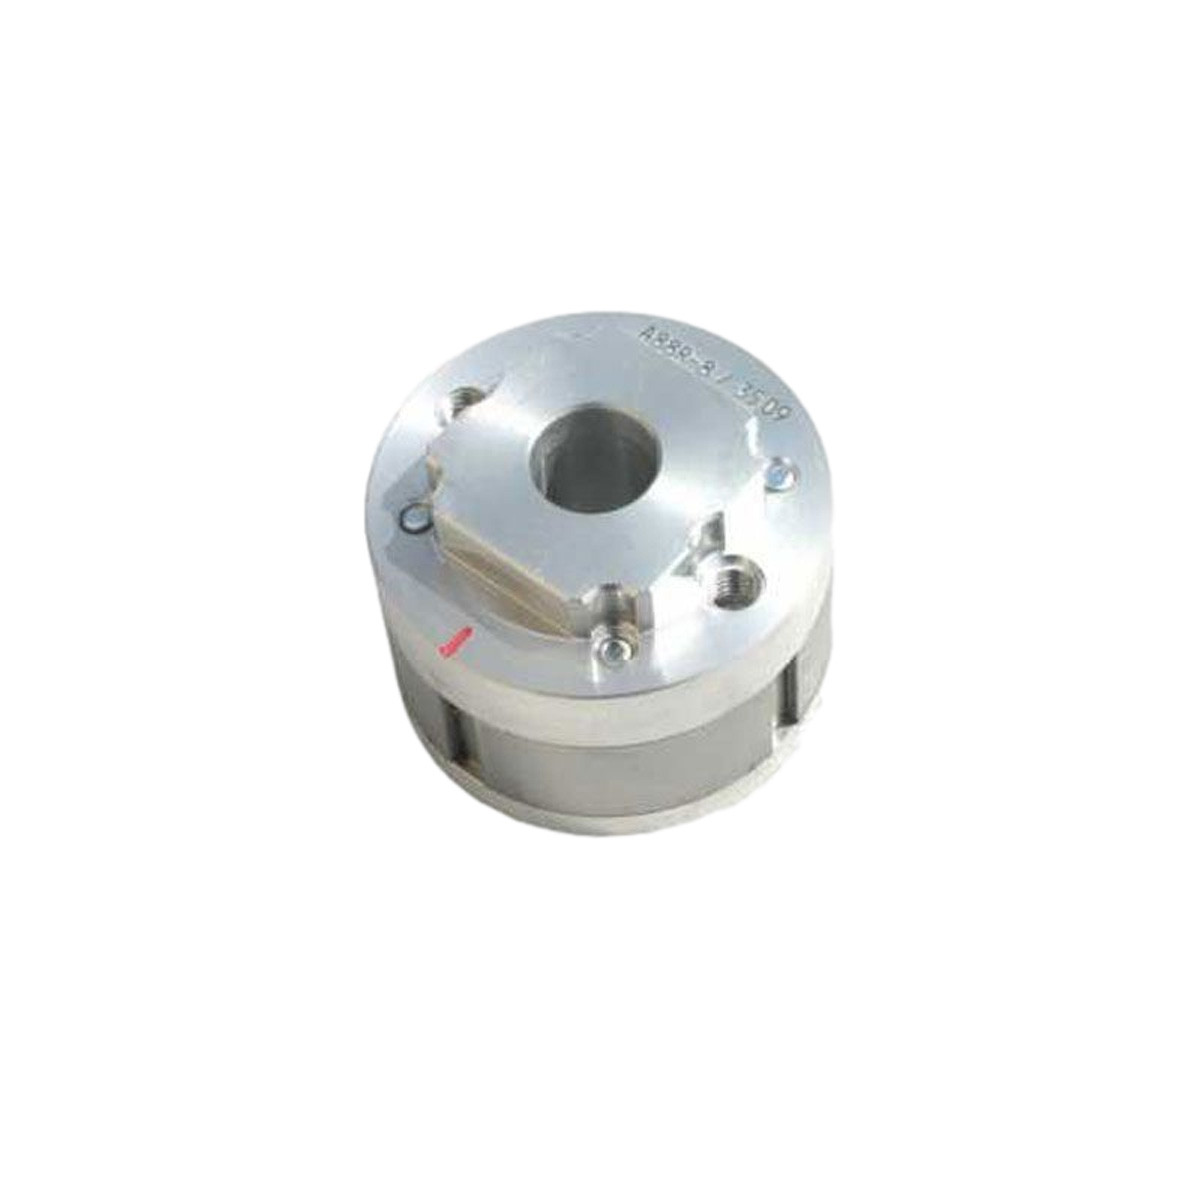 Rotor Allumage PEUGEOT 103 6V à Rupteurs - MVT PREMIUM PREM02